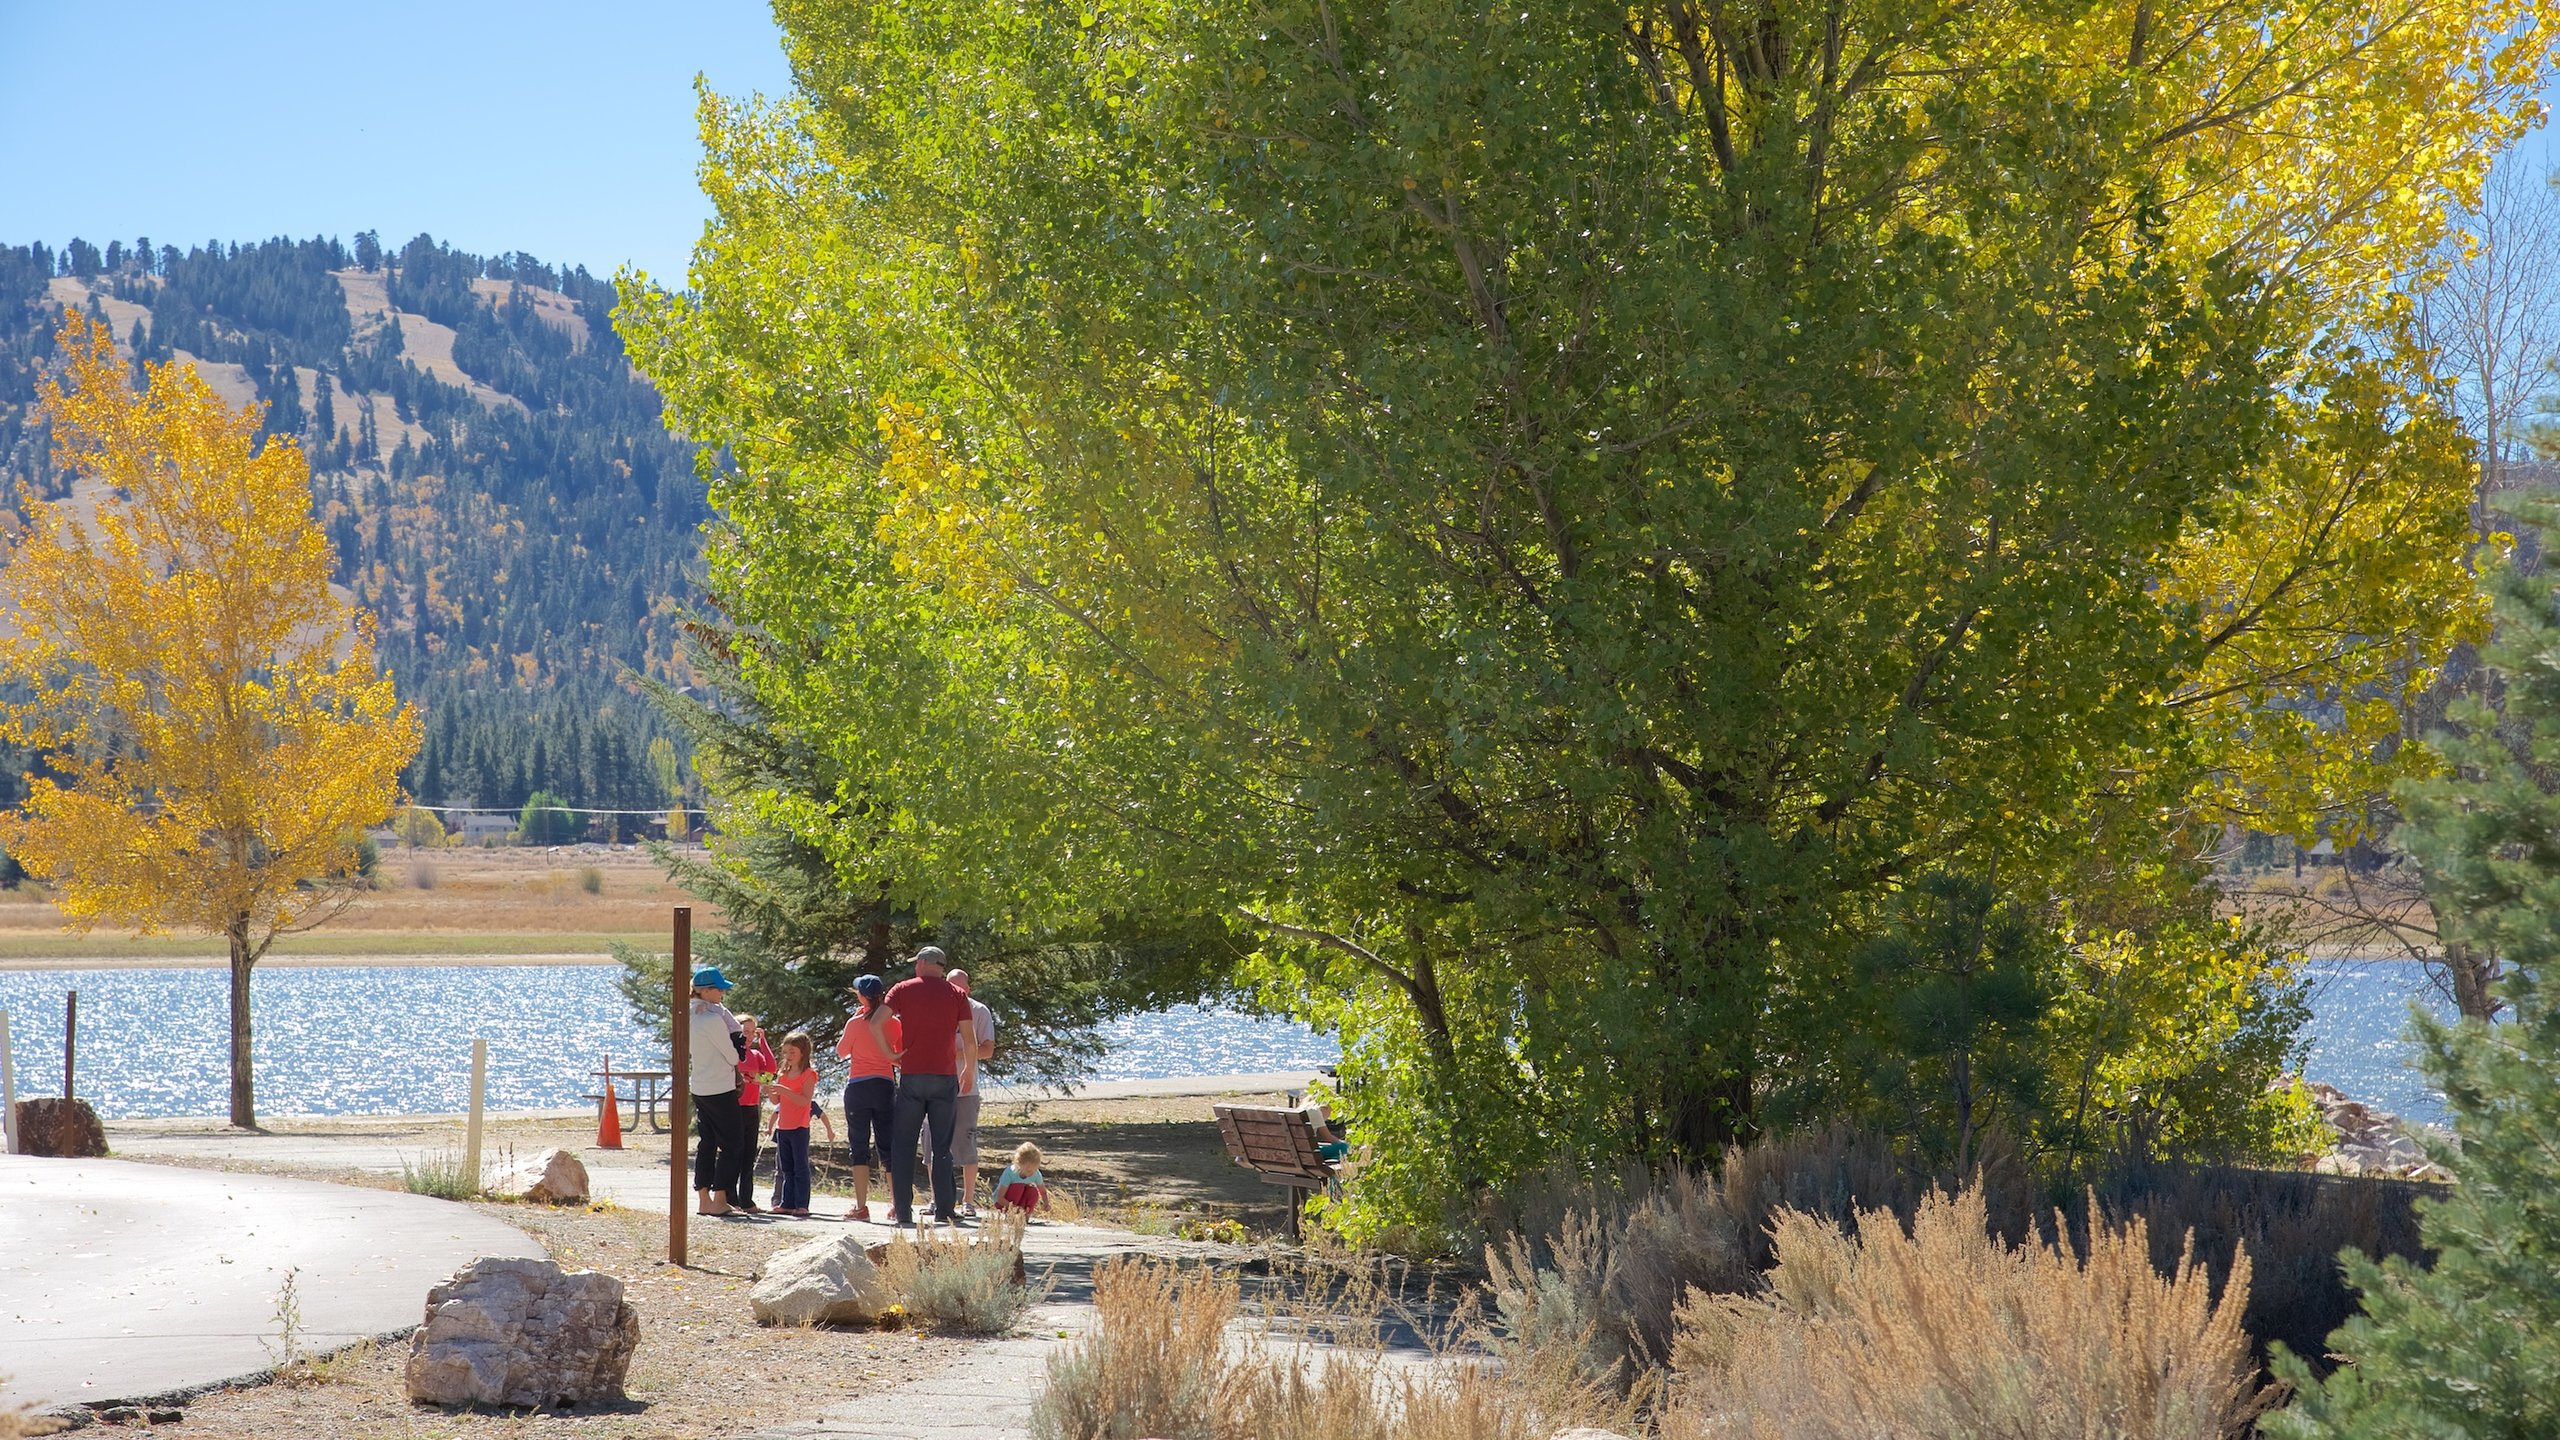 The Village, Big Bear Lake, California, United States of America